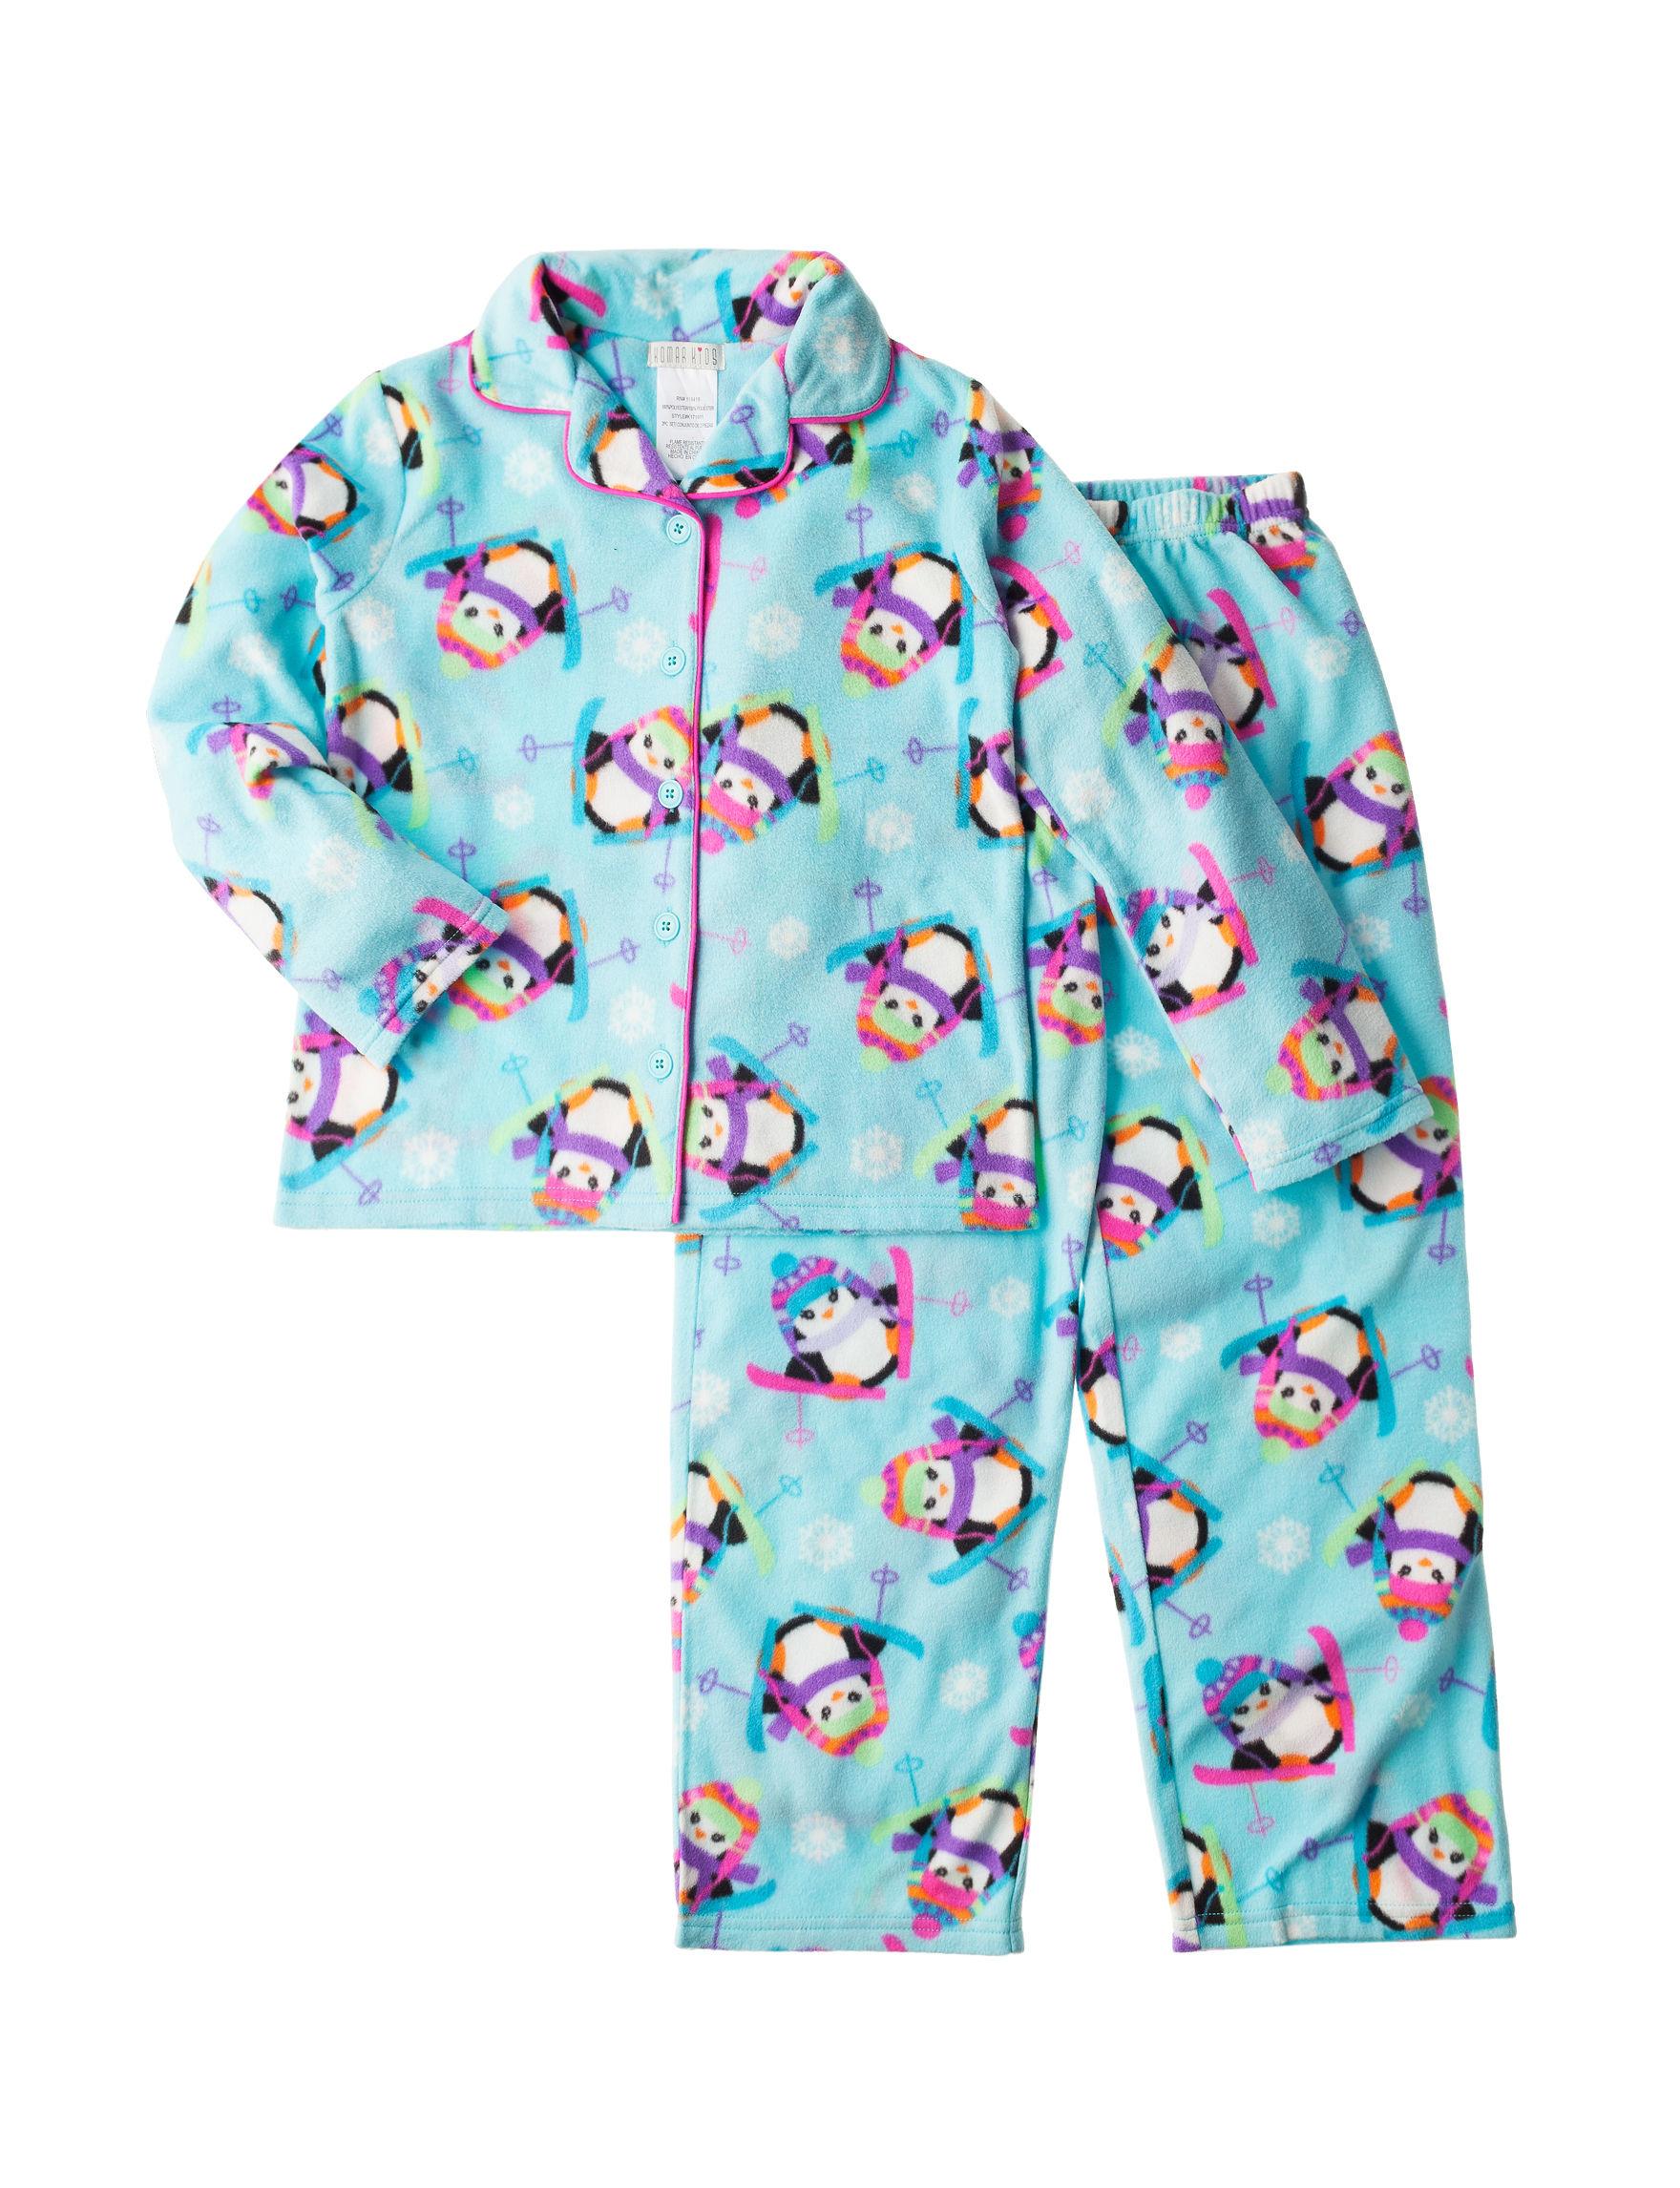 Komar Kids Teal Pajama Sets